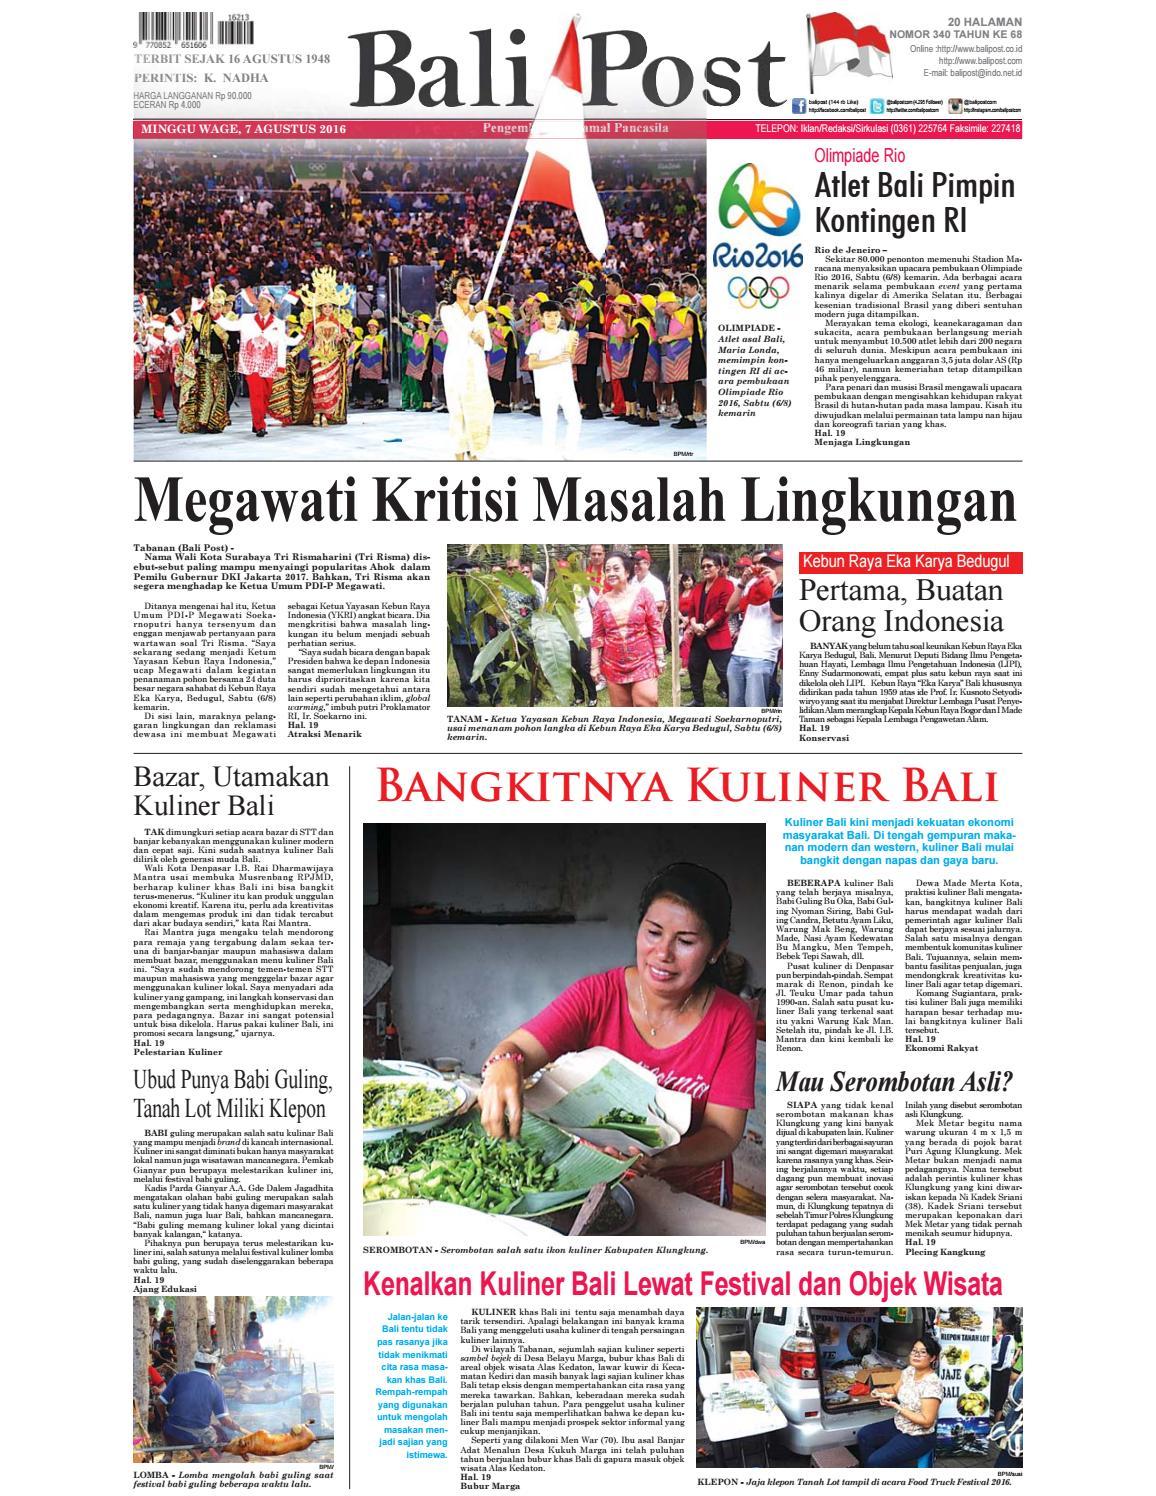 Edisi 7 Agustus 2016 Balipostcom By E Paper Kmb Issuu Produk Ukm Bumn Batik Tulis Babon Angrem